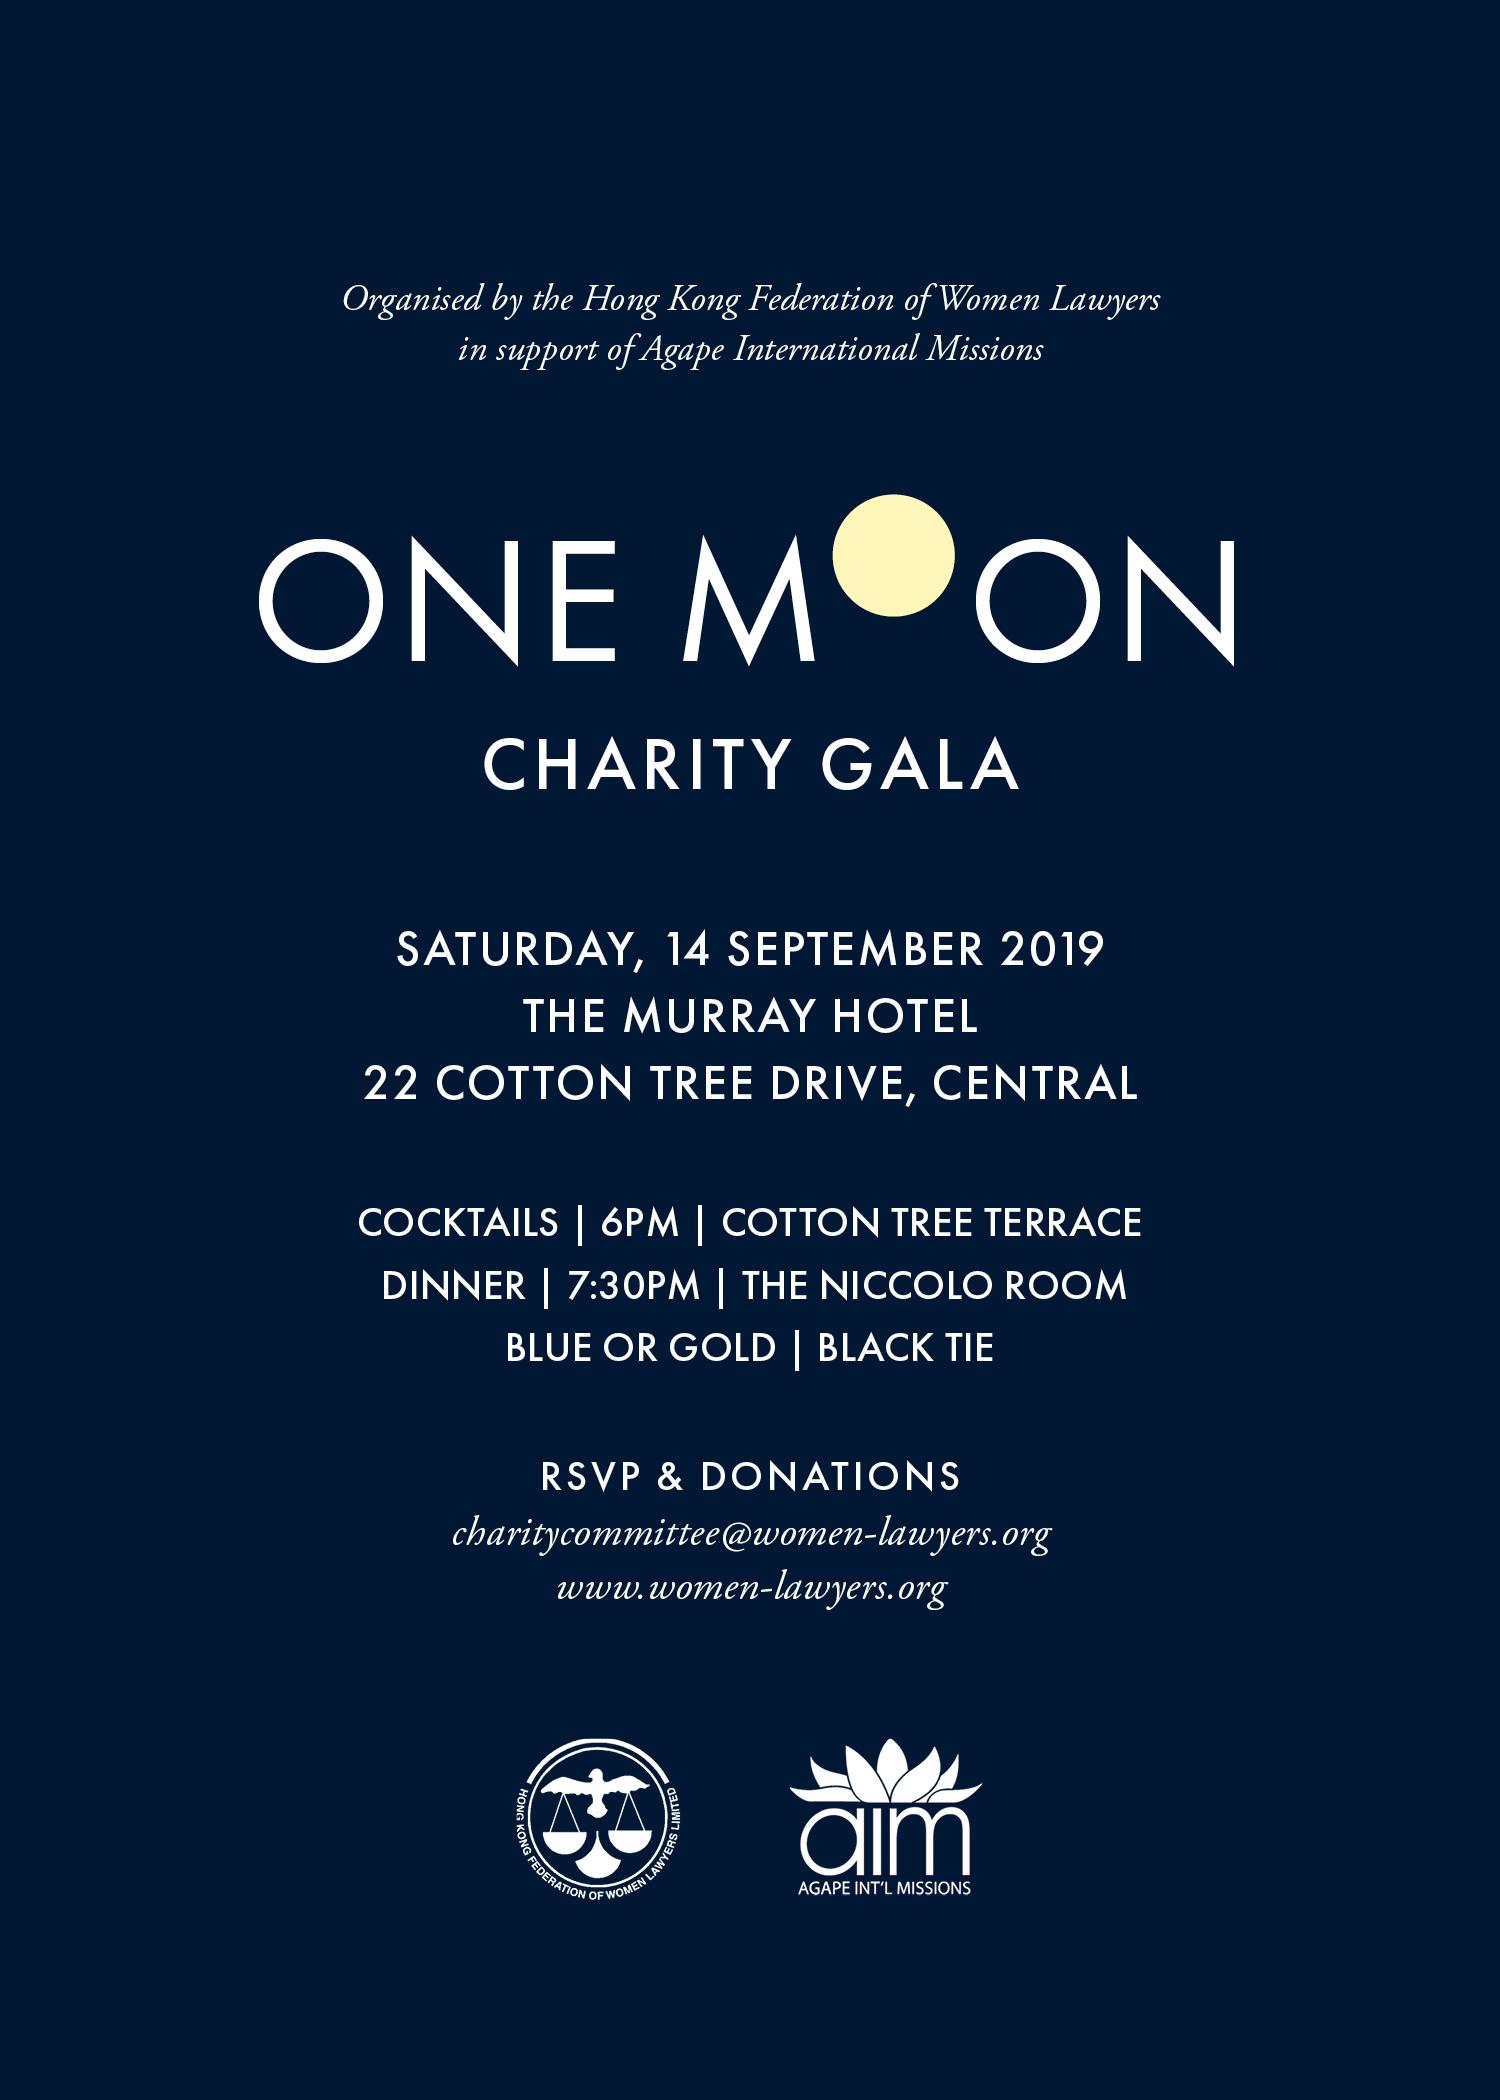 OneMoon_Cocktails_Invite.jpg